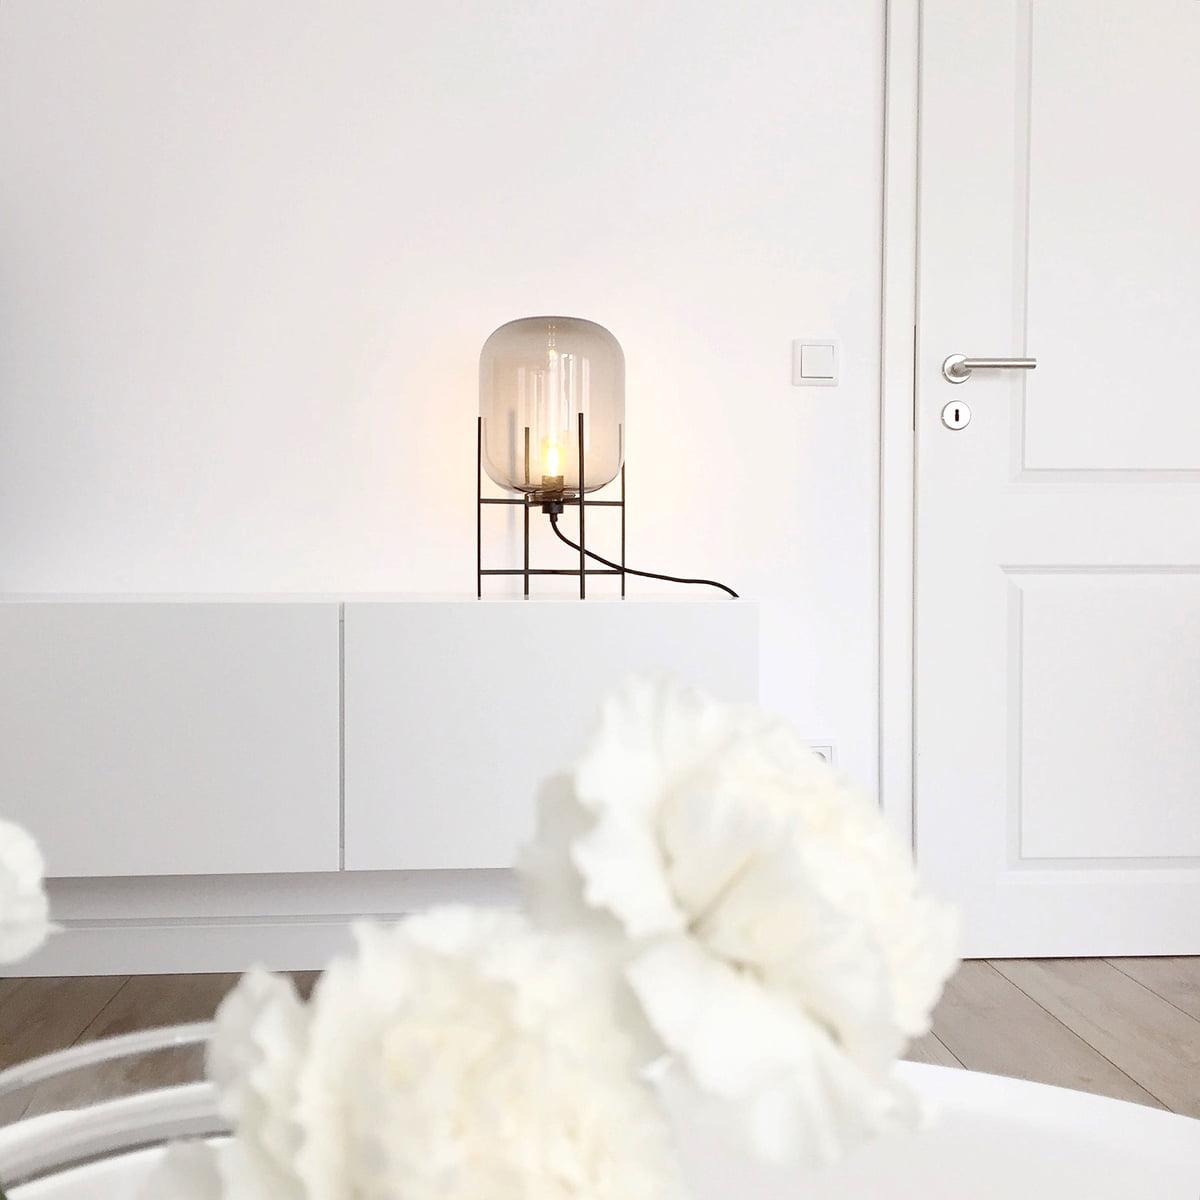 Oda leuchte small pulpo im wohndesign shop for Wohndesign shop